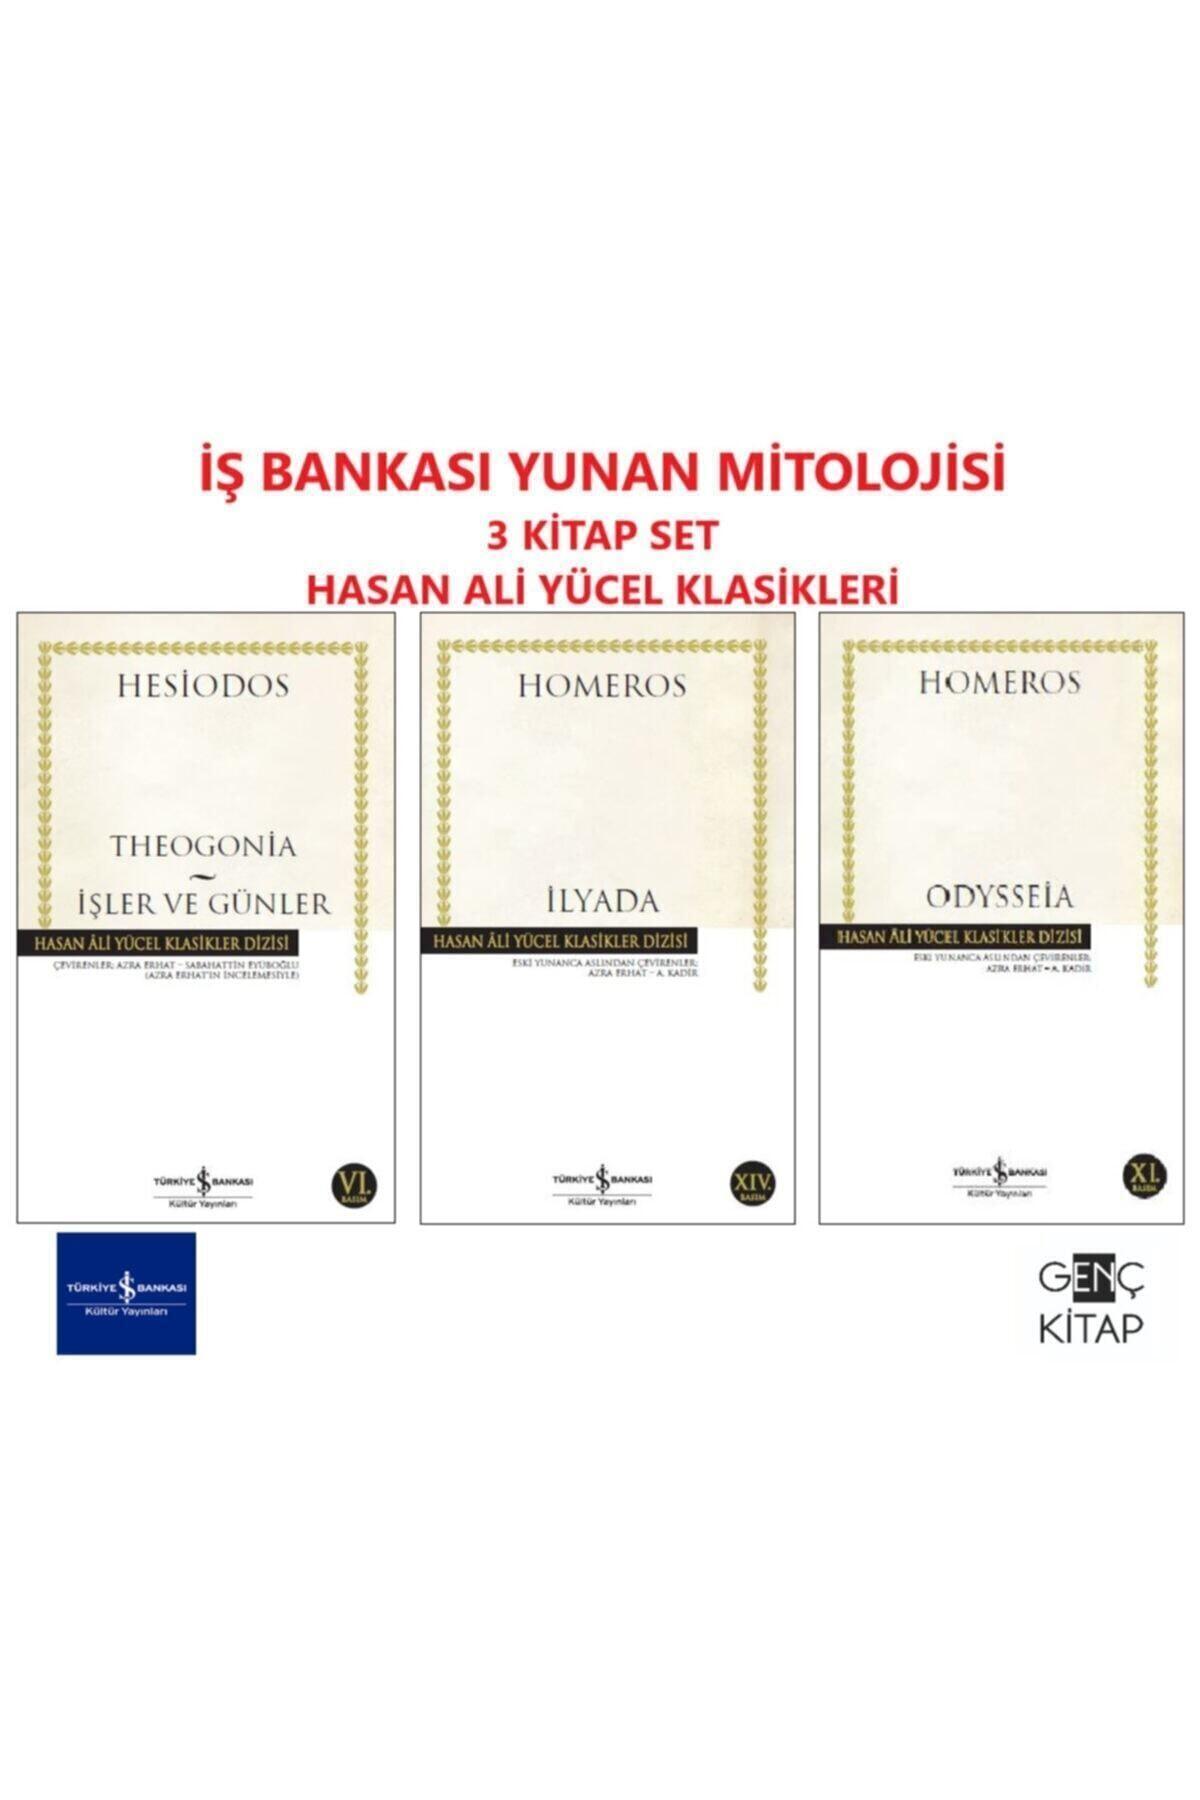 Iş Bankası Yunan Mitolojisi 3 Kitap Set Hasan Ali Yücel Klasikler Homeros-ilyada-odysseia